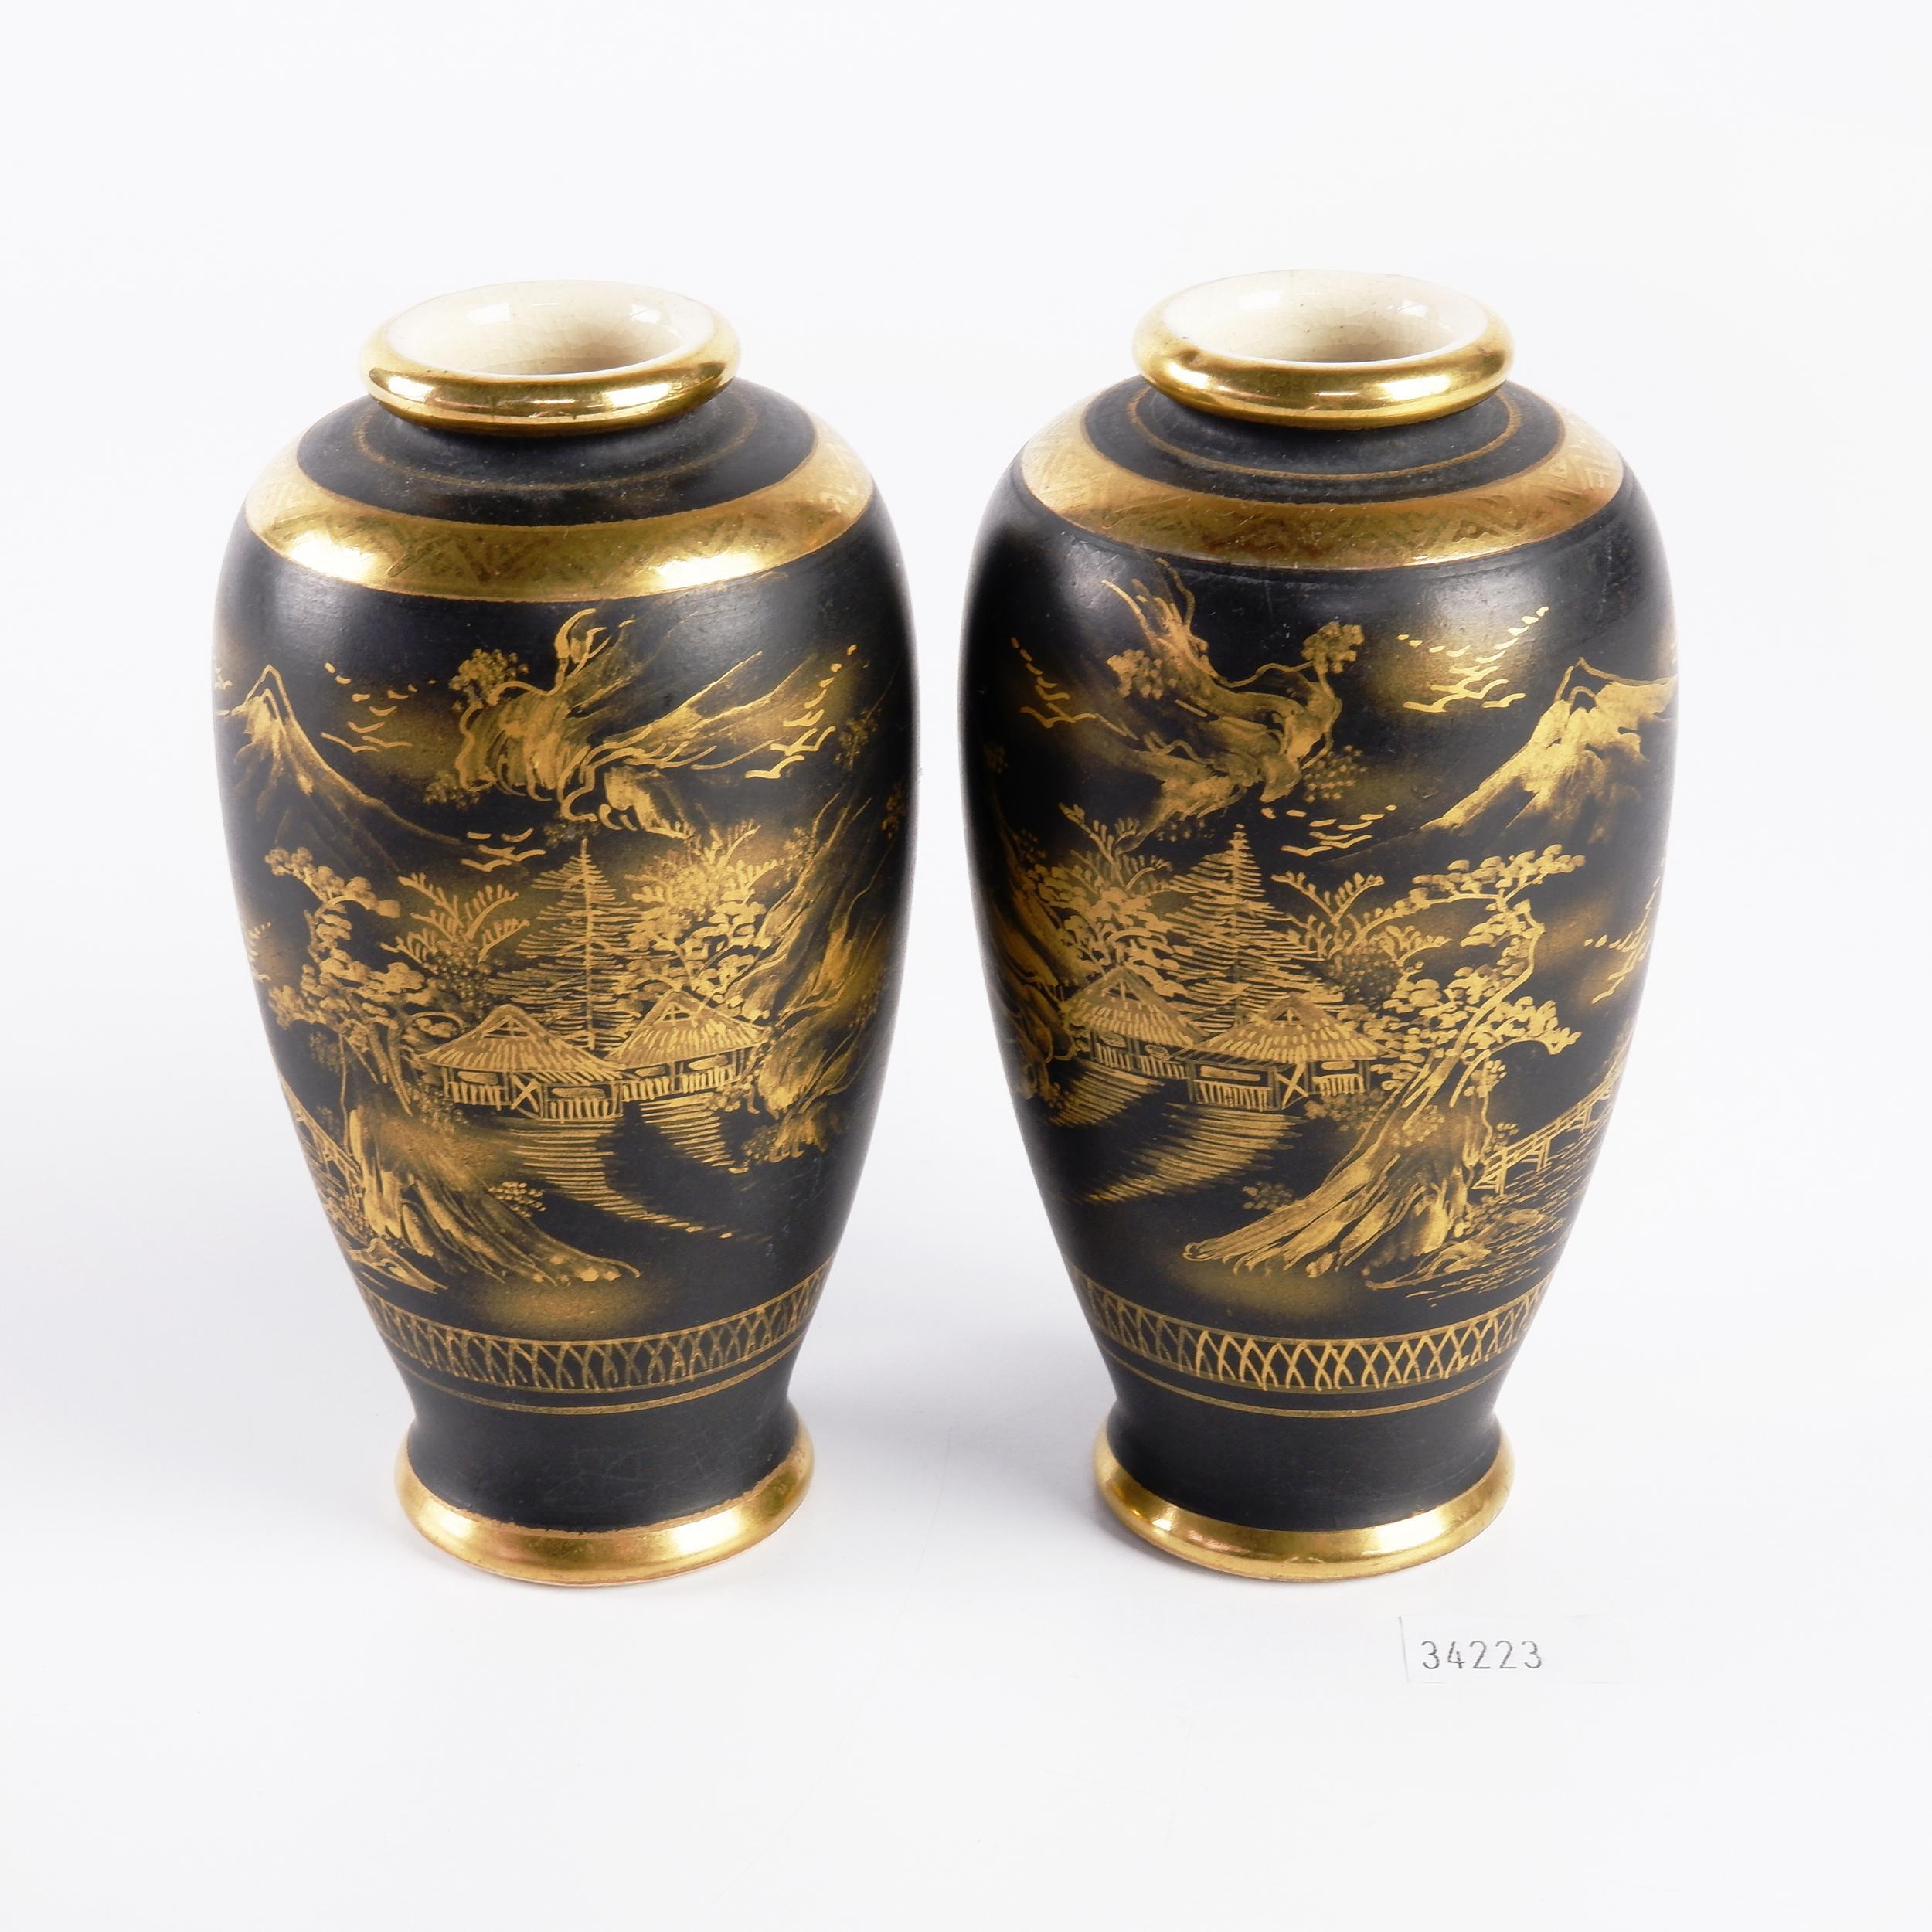 'Pair of Japanese Black Satsuma Vases, 20th Century'